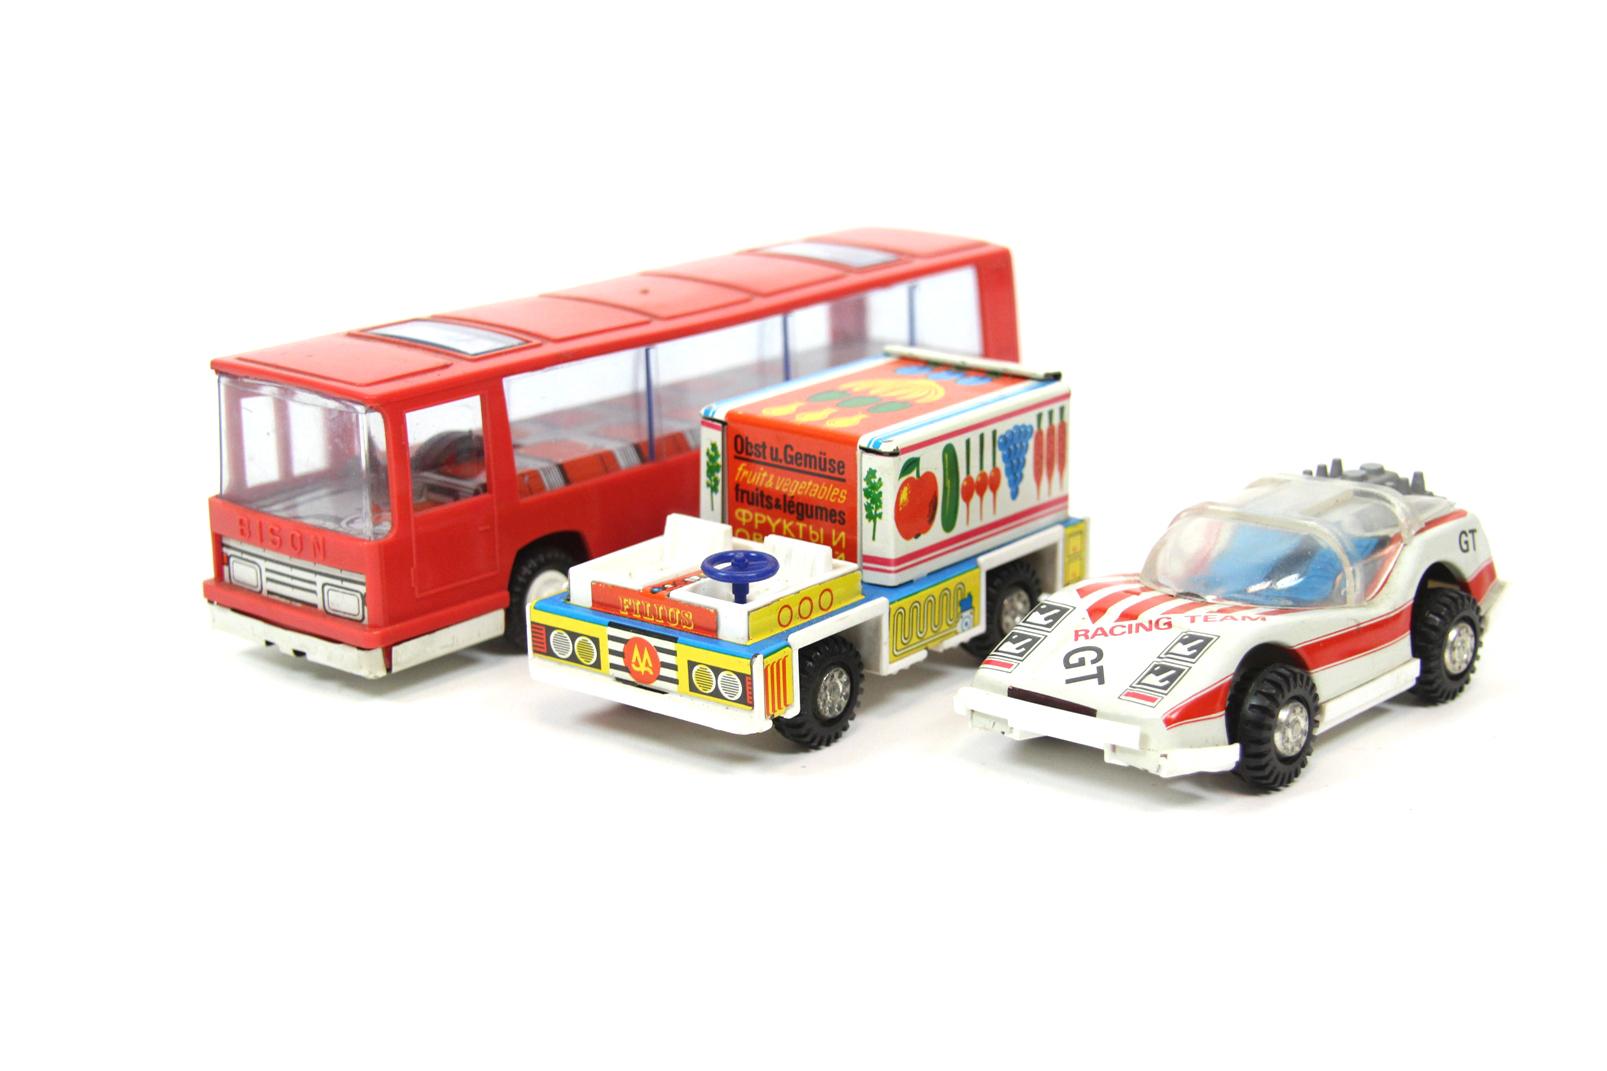 Spielzeugautos ddr bison bus filius lebensmittelauto